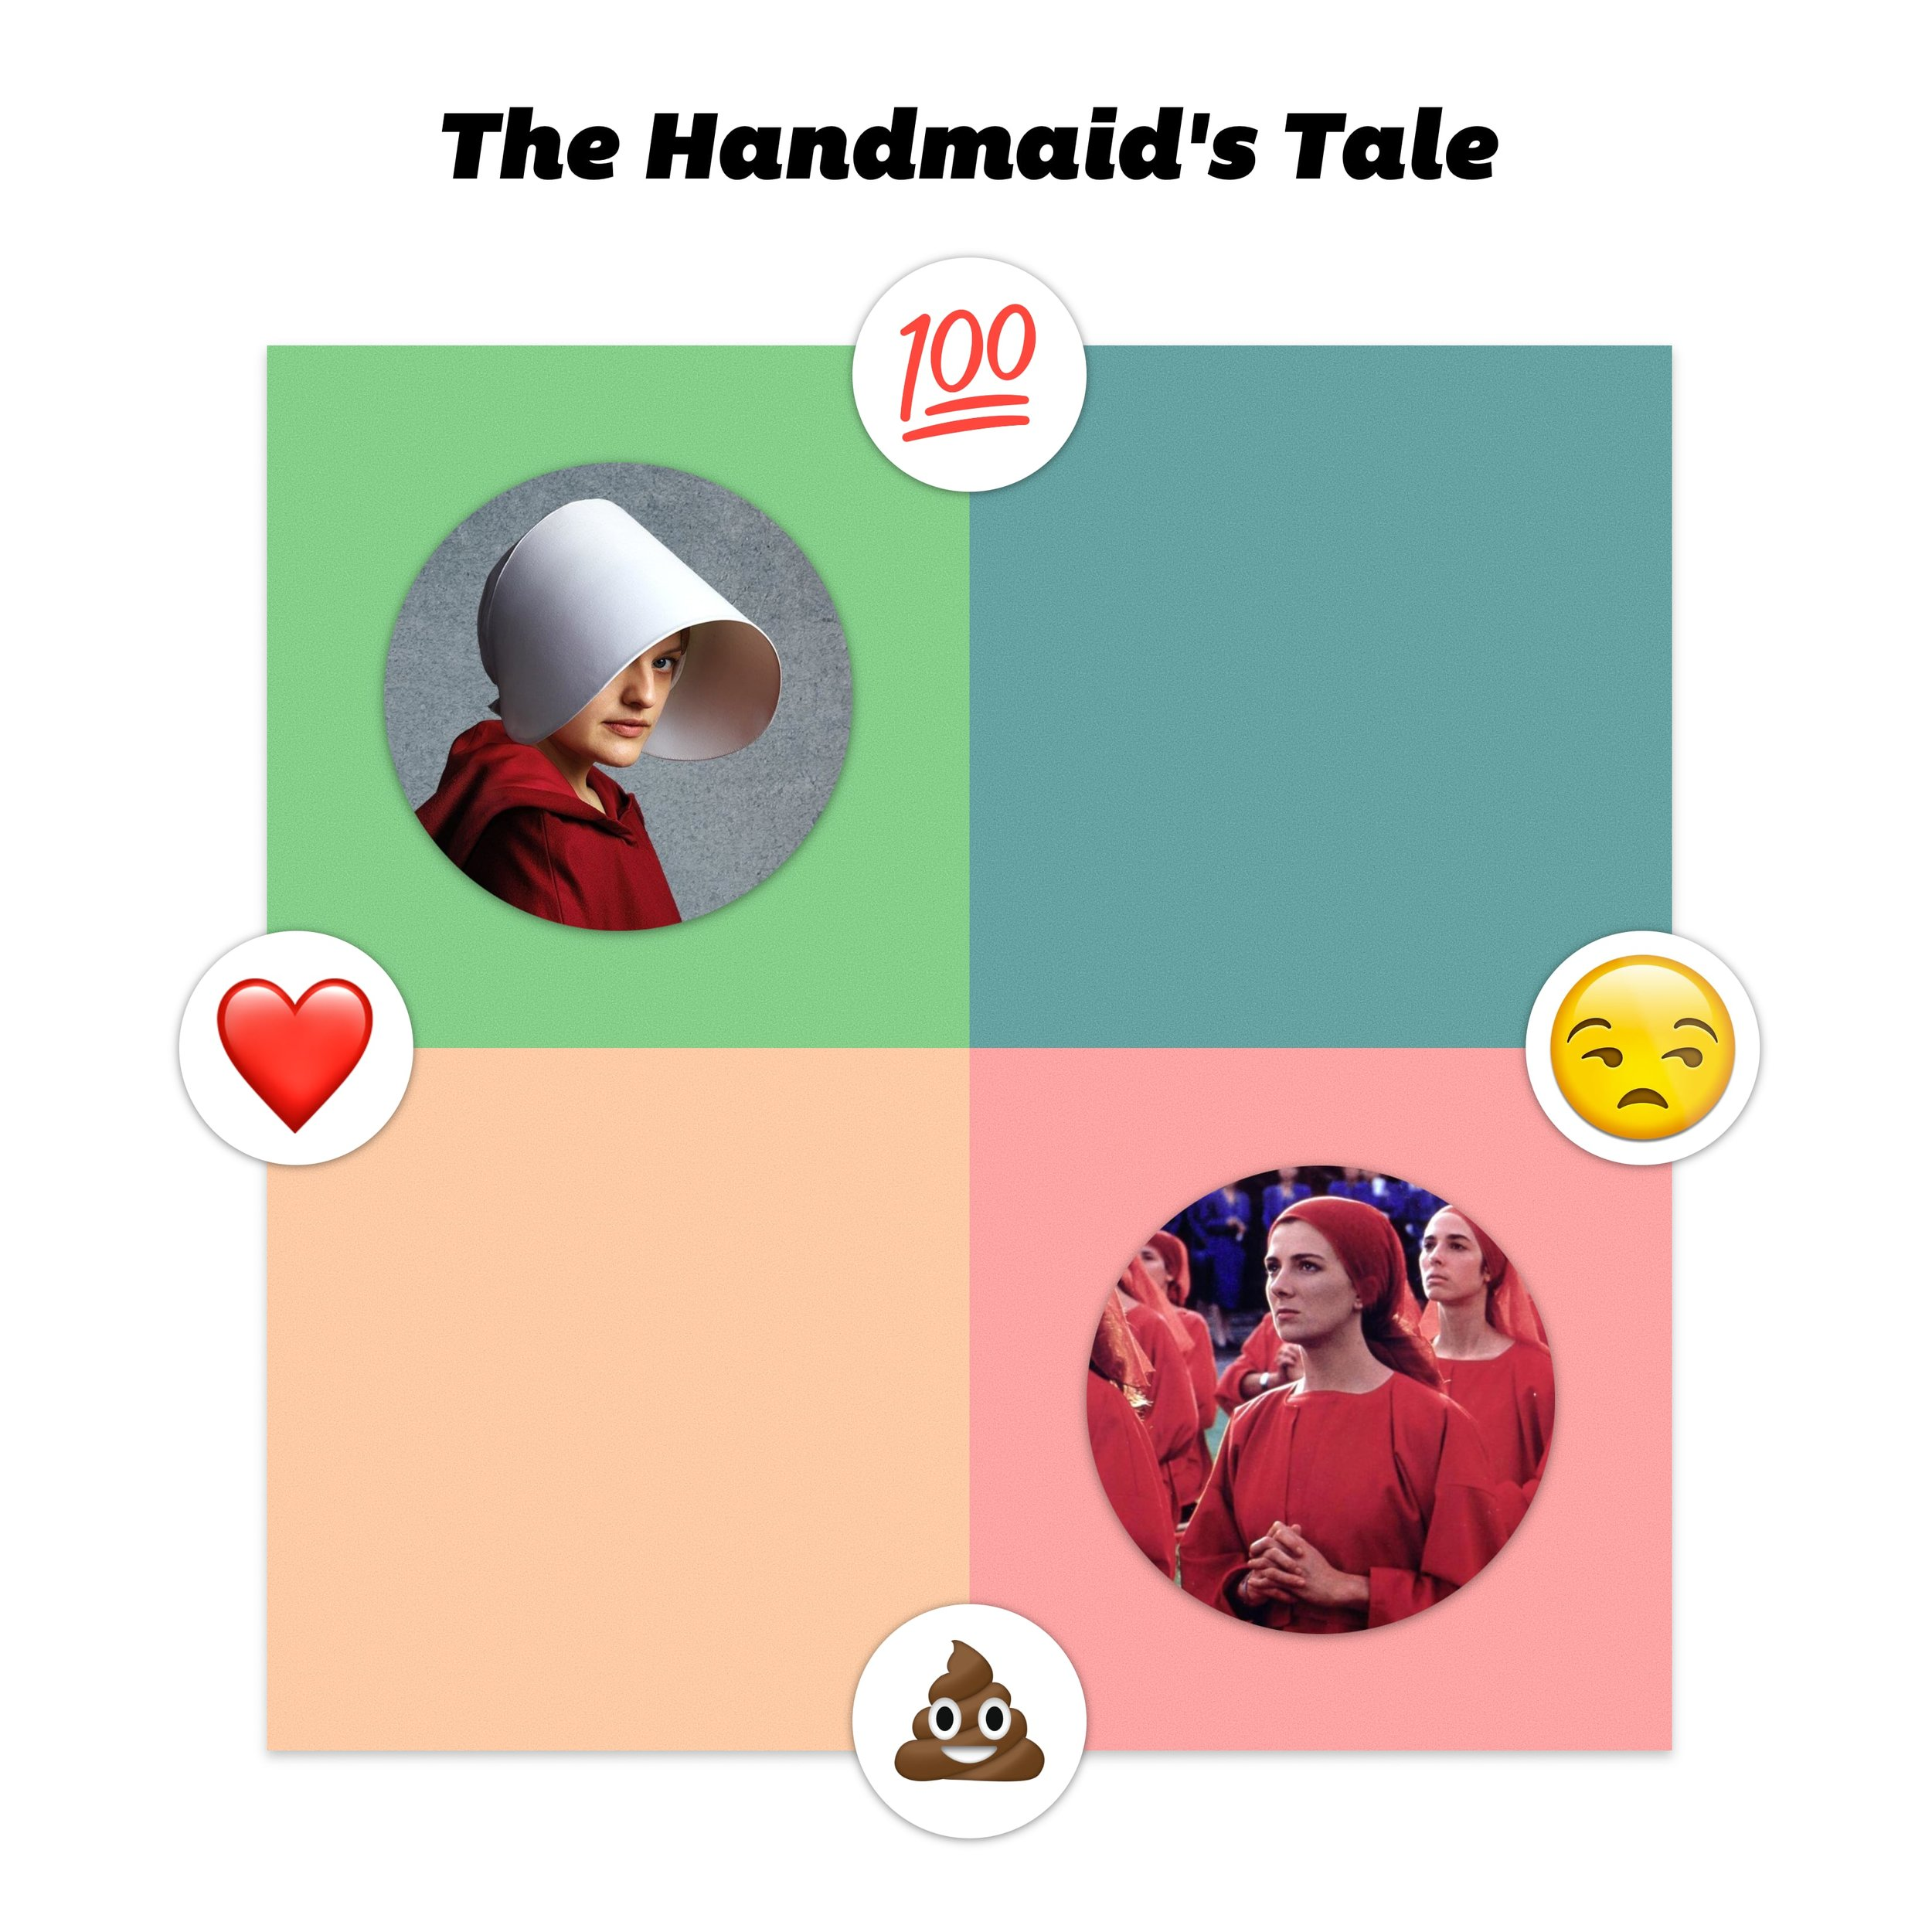 9. The Handmaid's Tale